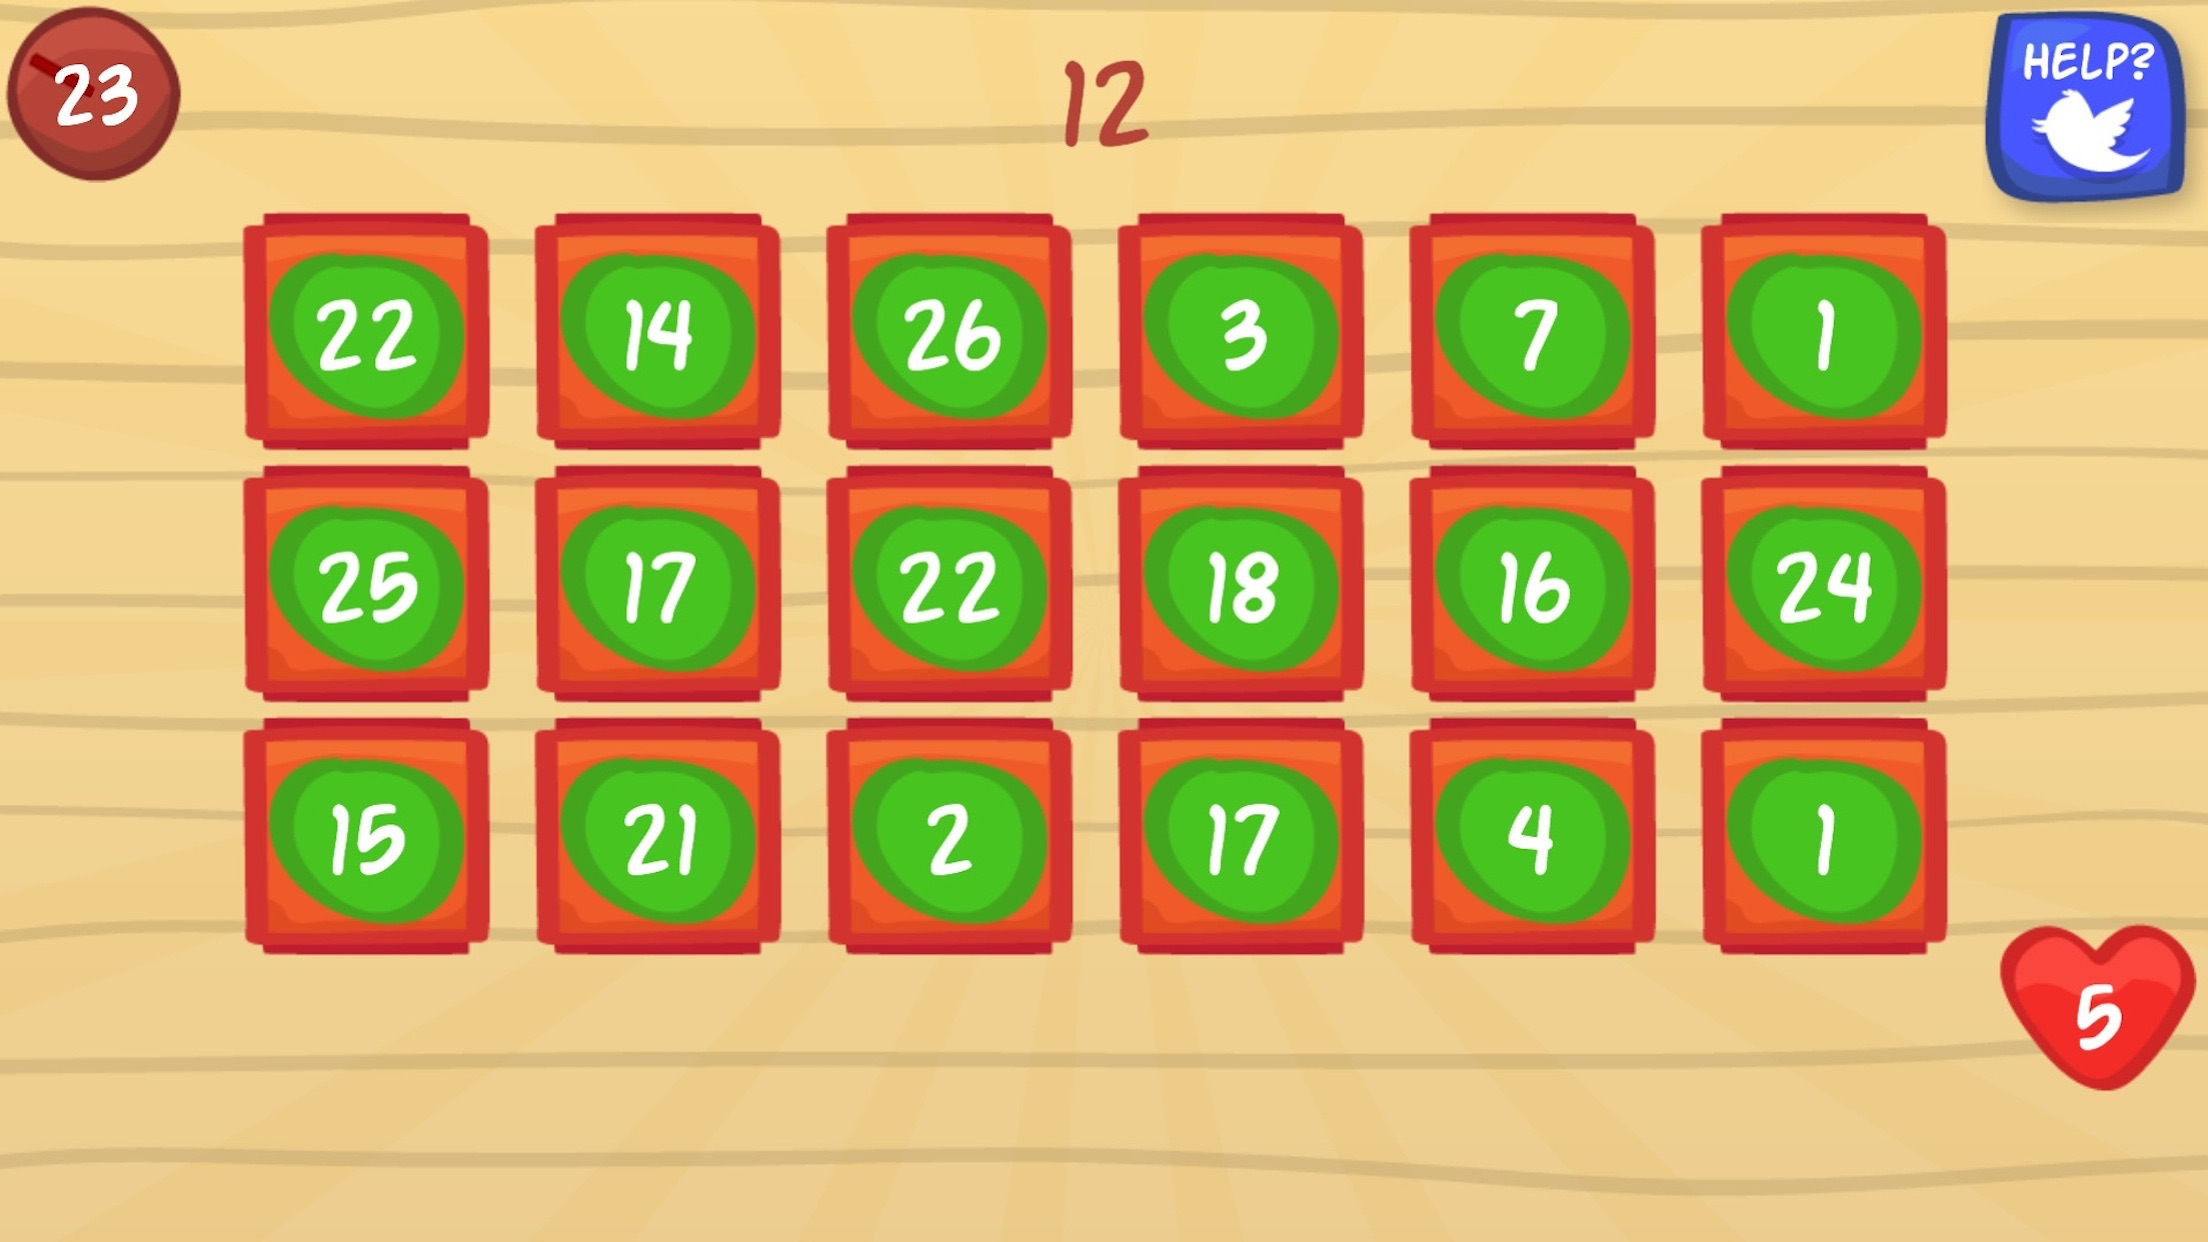 The Impossible Test 3 - Fun Free Trivia Game Screenshot